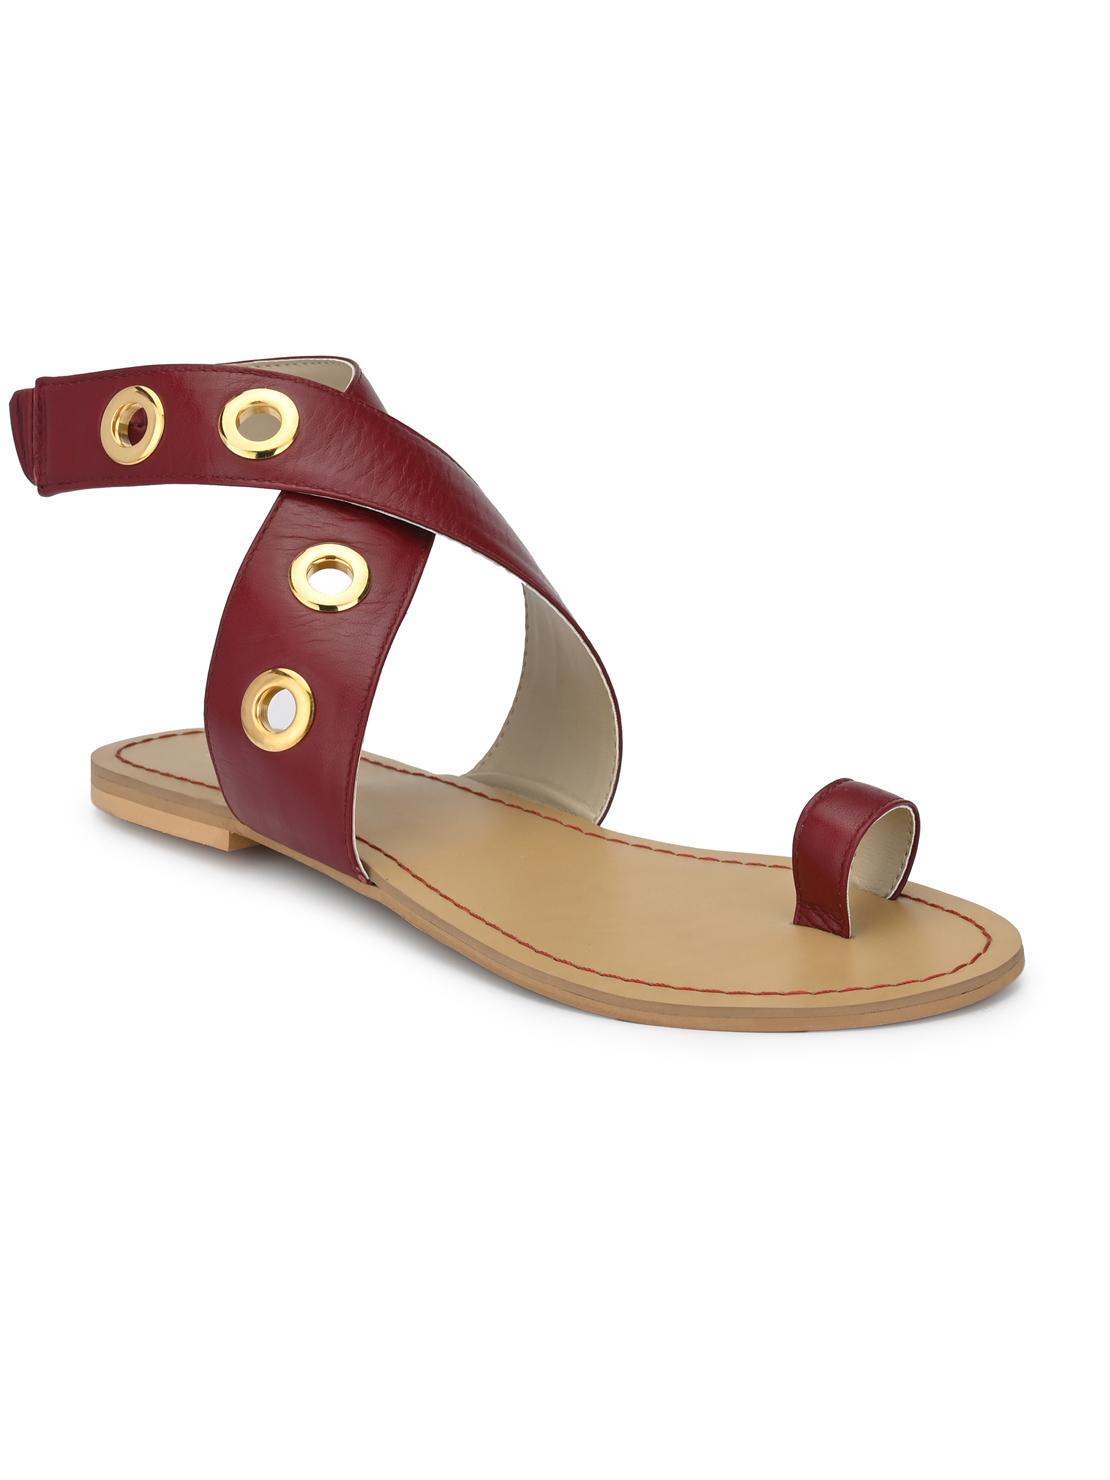 AADY AUSTIN | Aady Austin Flat Sandals - Maroon